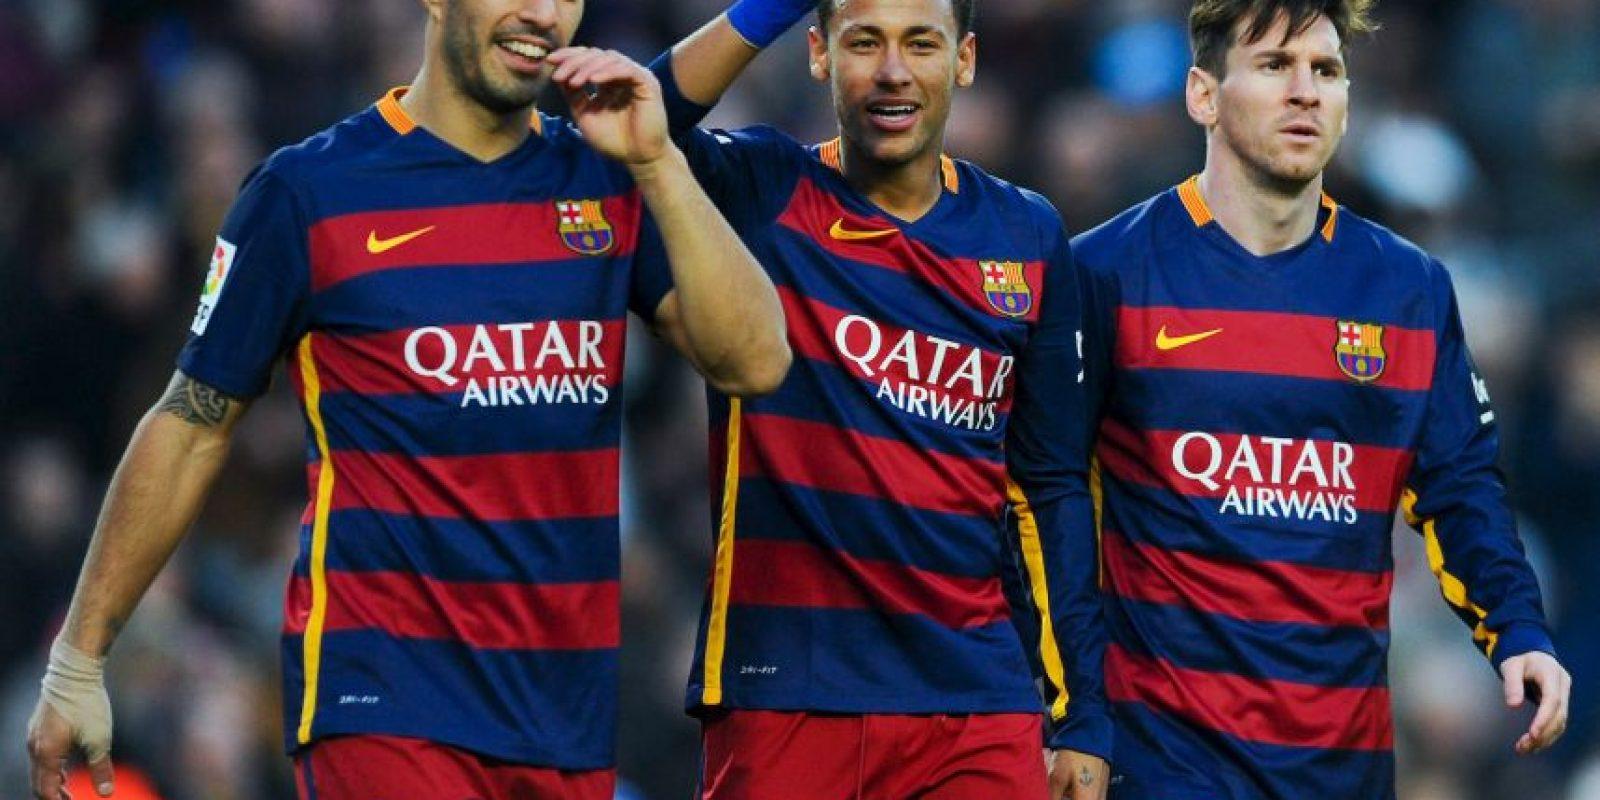 El 57% de sus goles los anotó en el Camp Nou